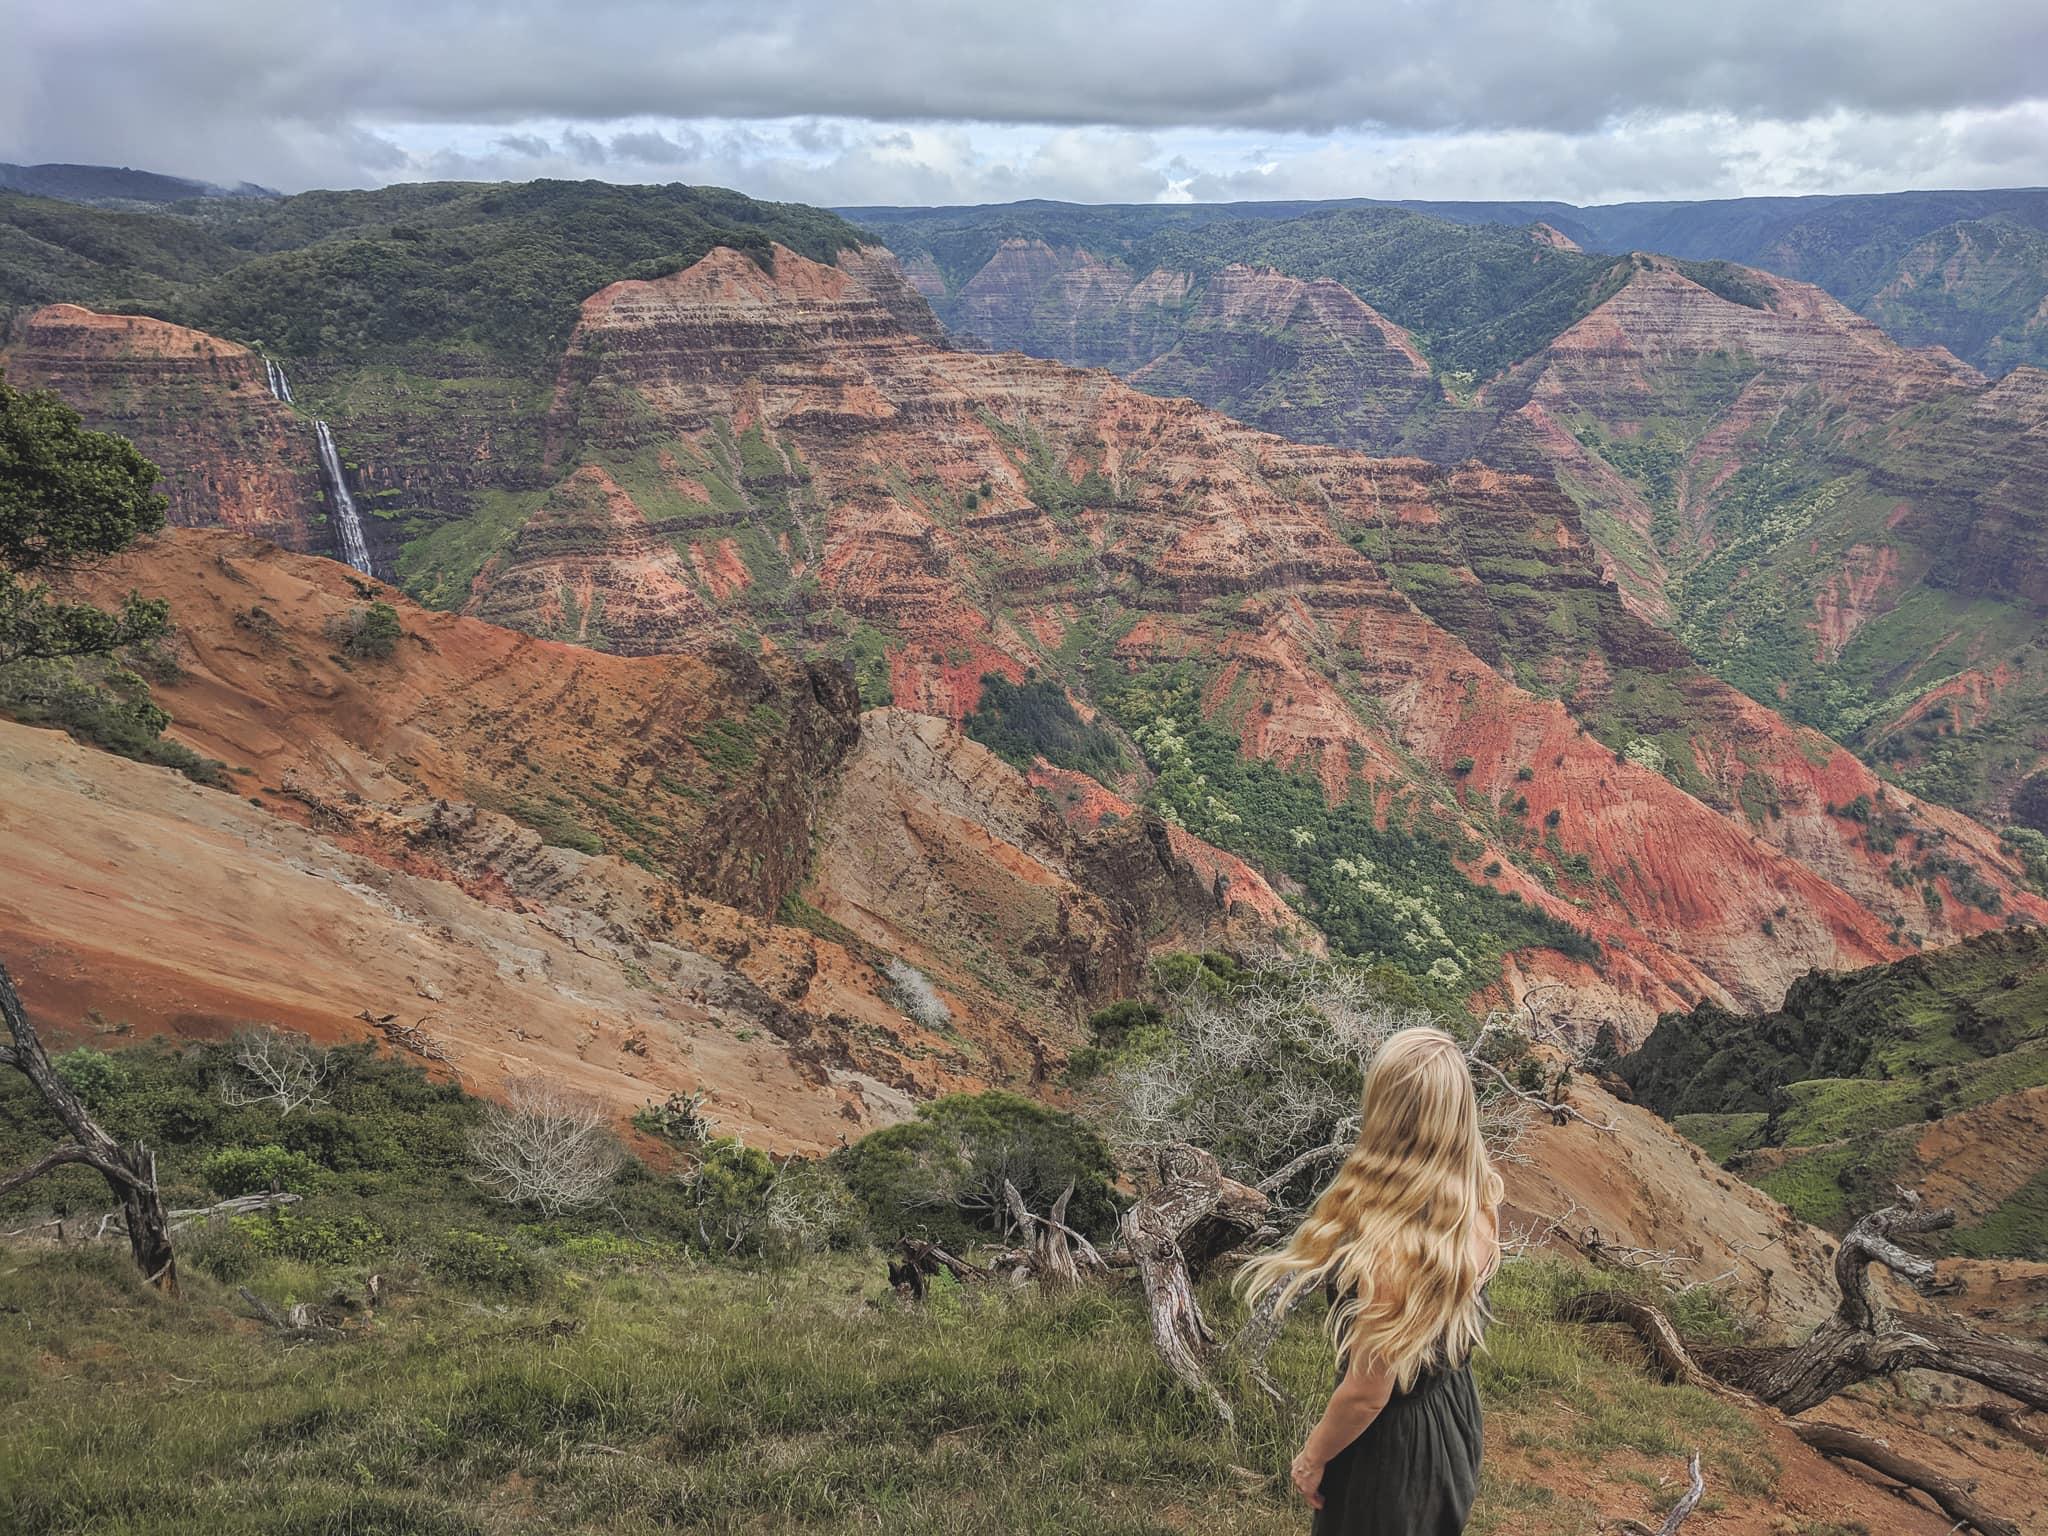 A View of Waimea Canyon. Things To Do In Kauai.